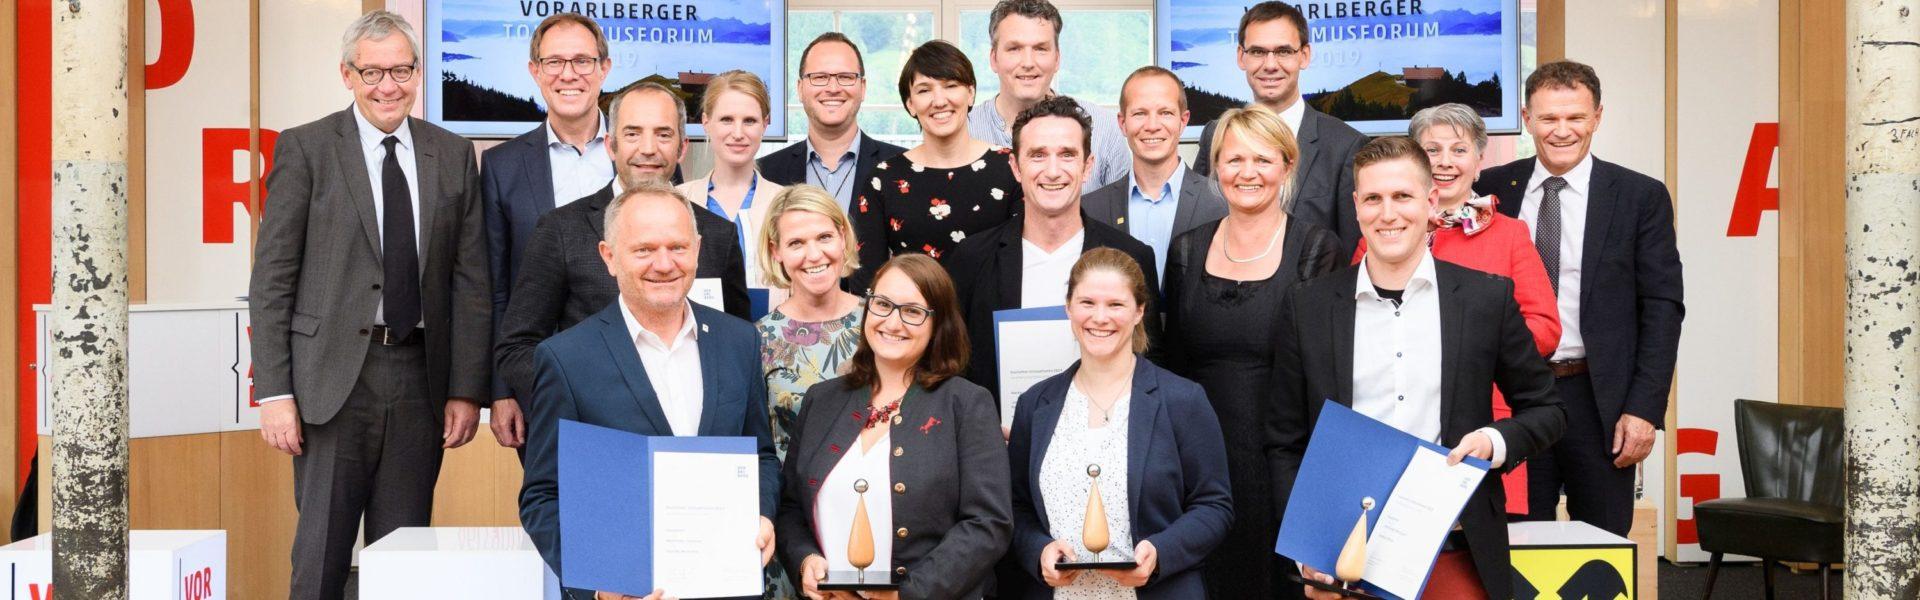 Die Innovationspreisträger 2019, Fabrik Klarenbrunn, (c) Matthias Rhomberg